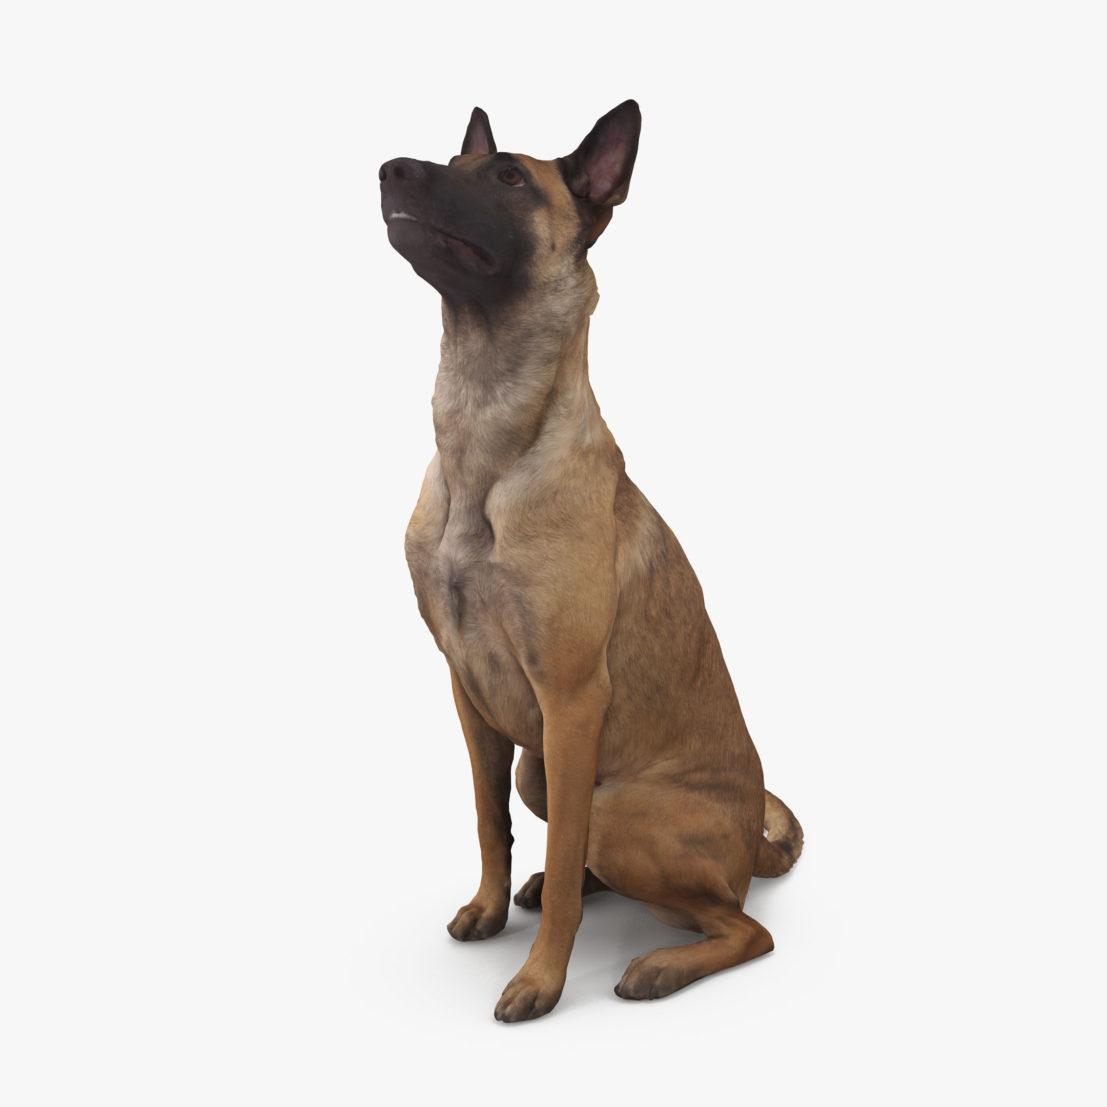 Malinois Dog Sitting 3D Model | 3DTree Scanning Studio